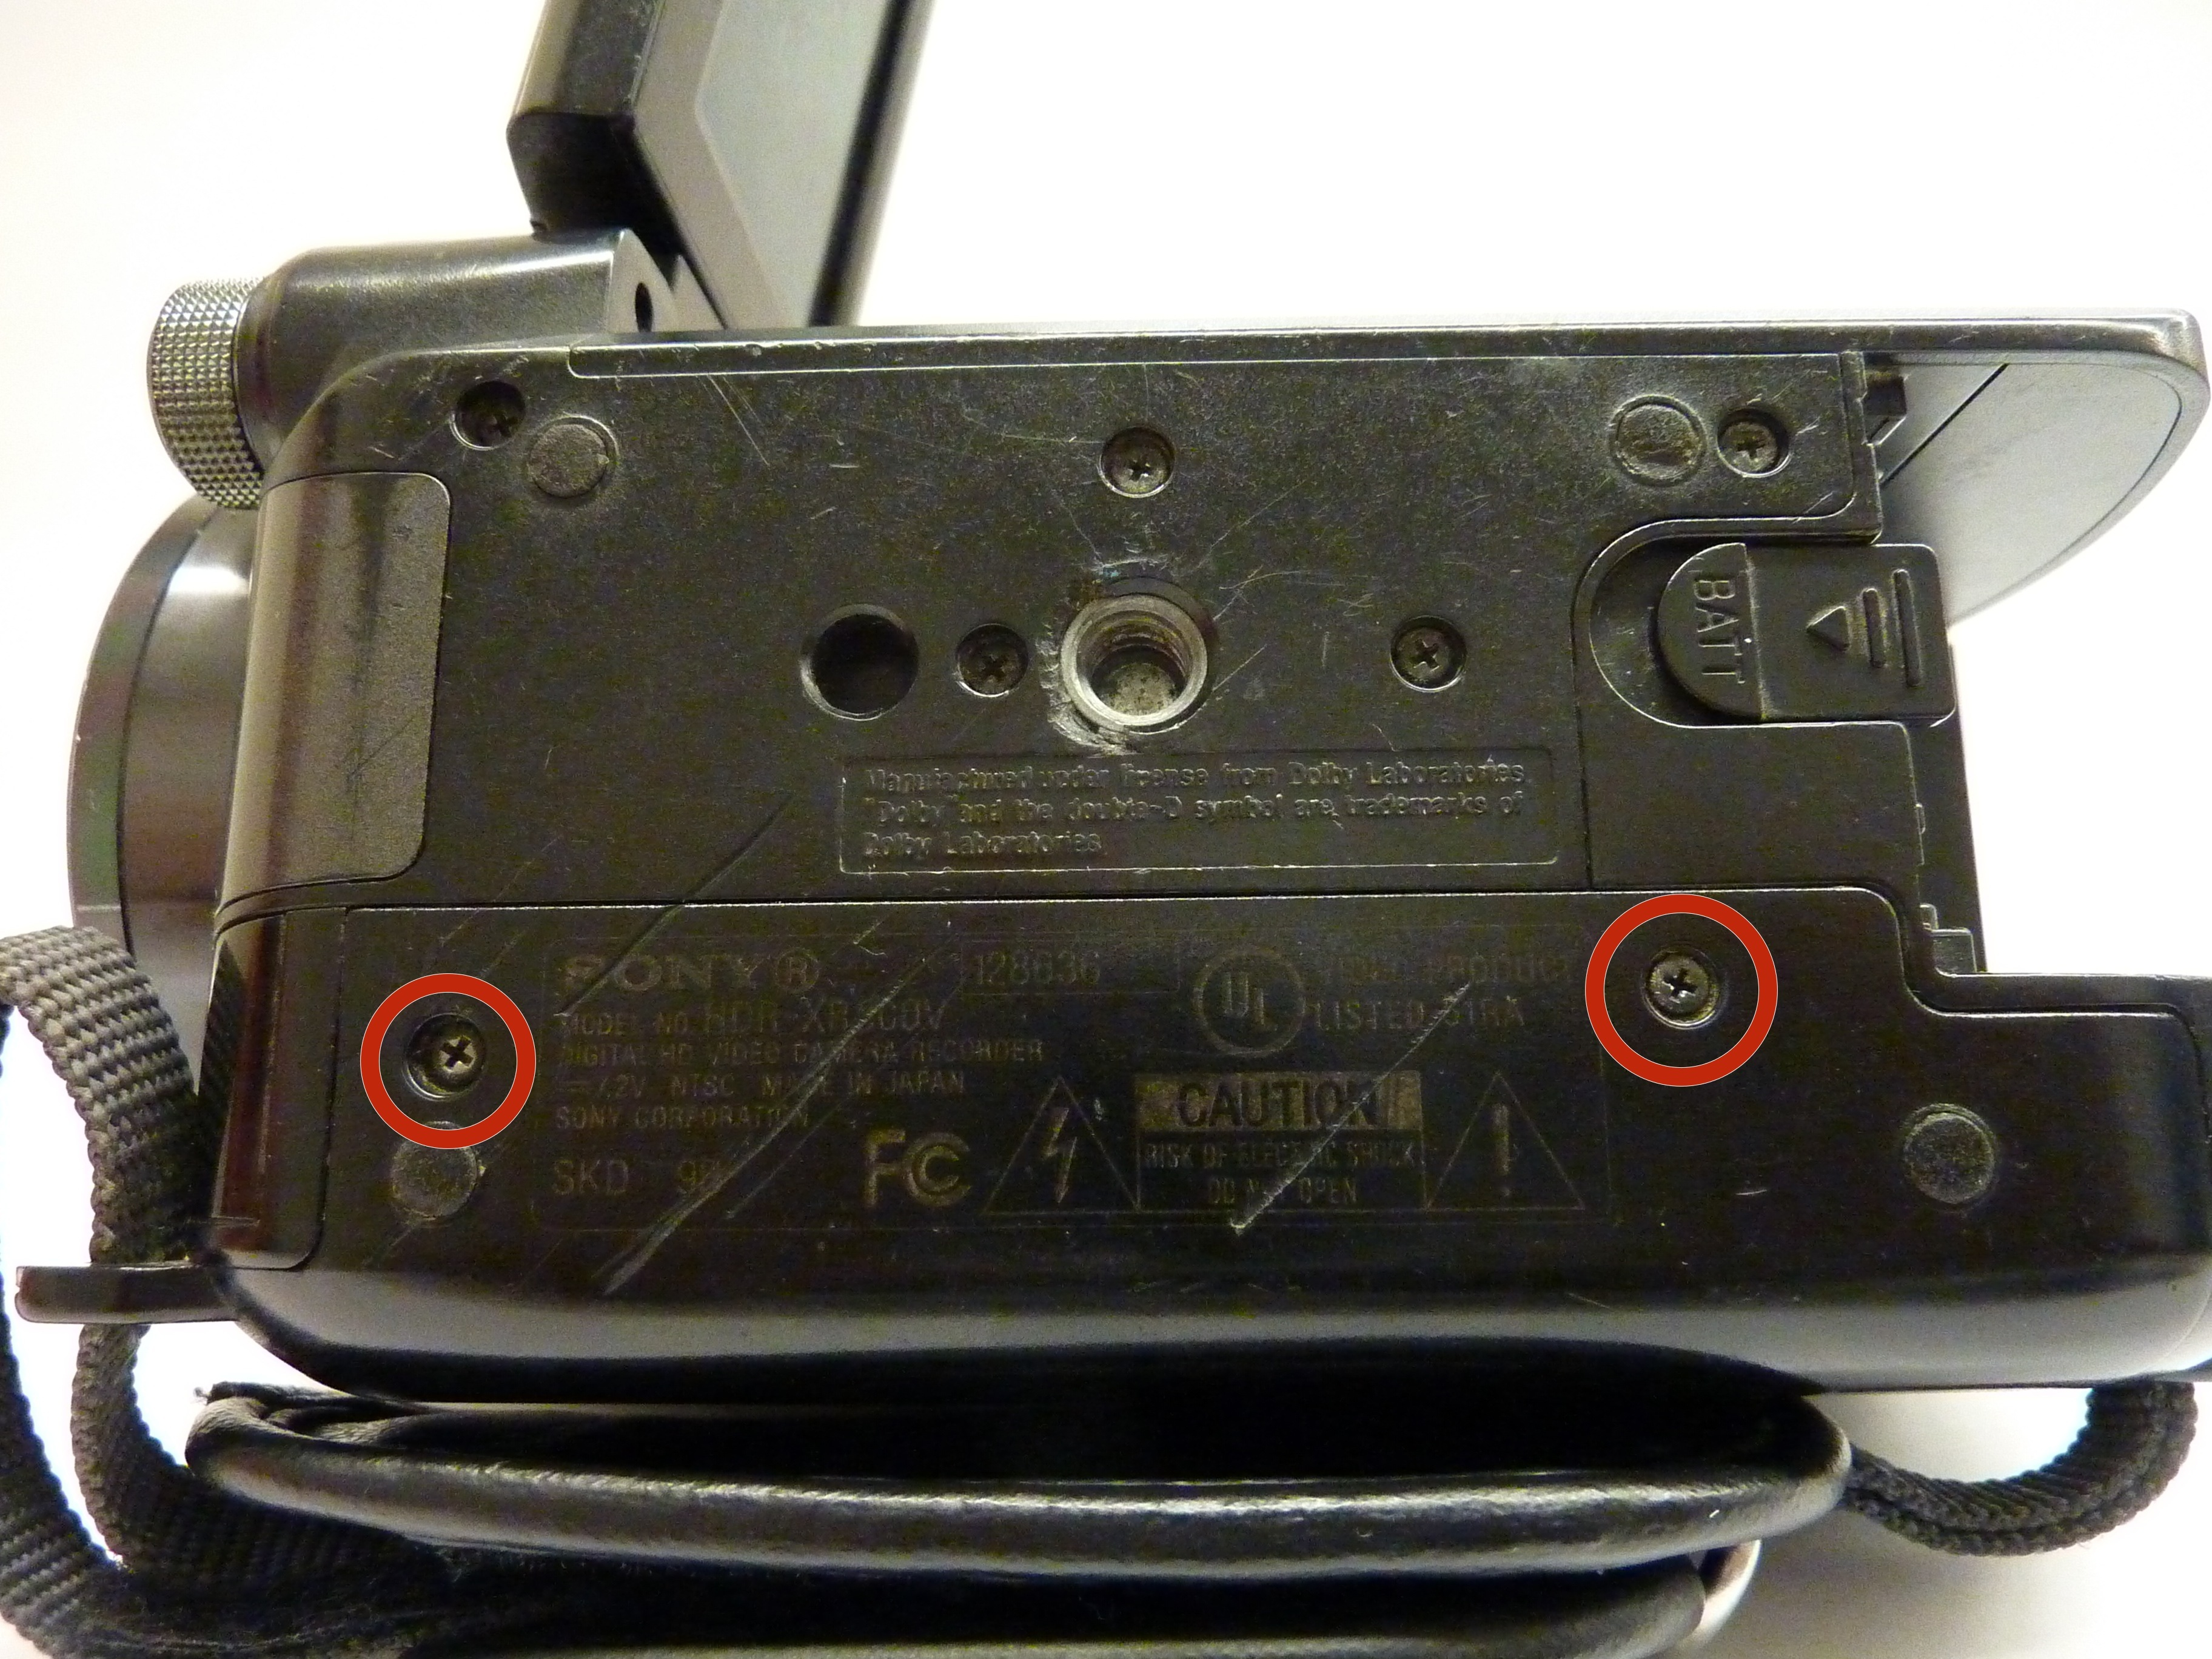 Sony Handycam Hdr Xr500v Repair Ifixit Pj810 Camcorder Hard Drive